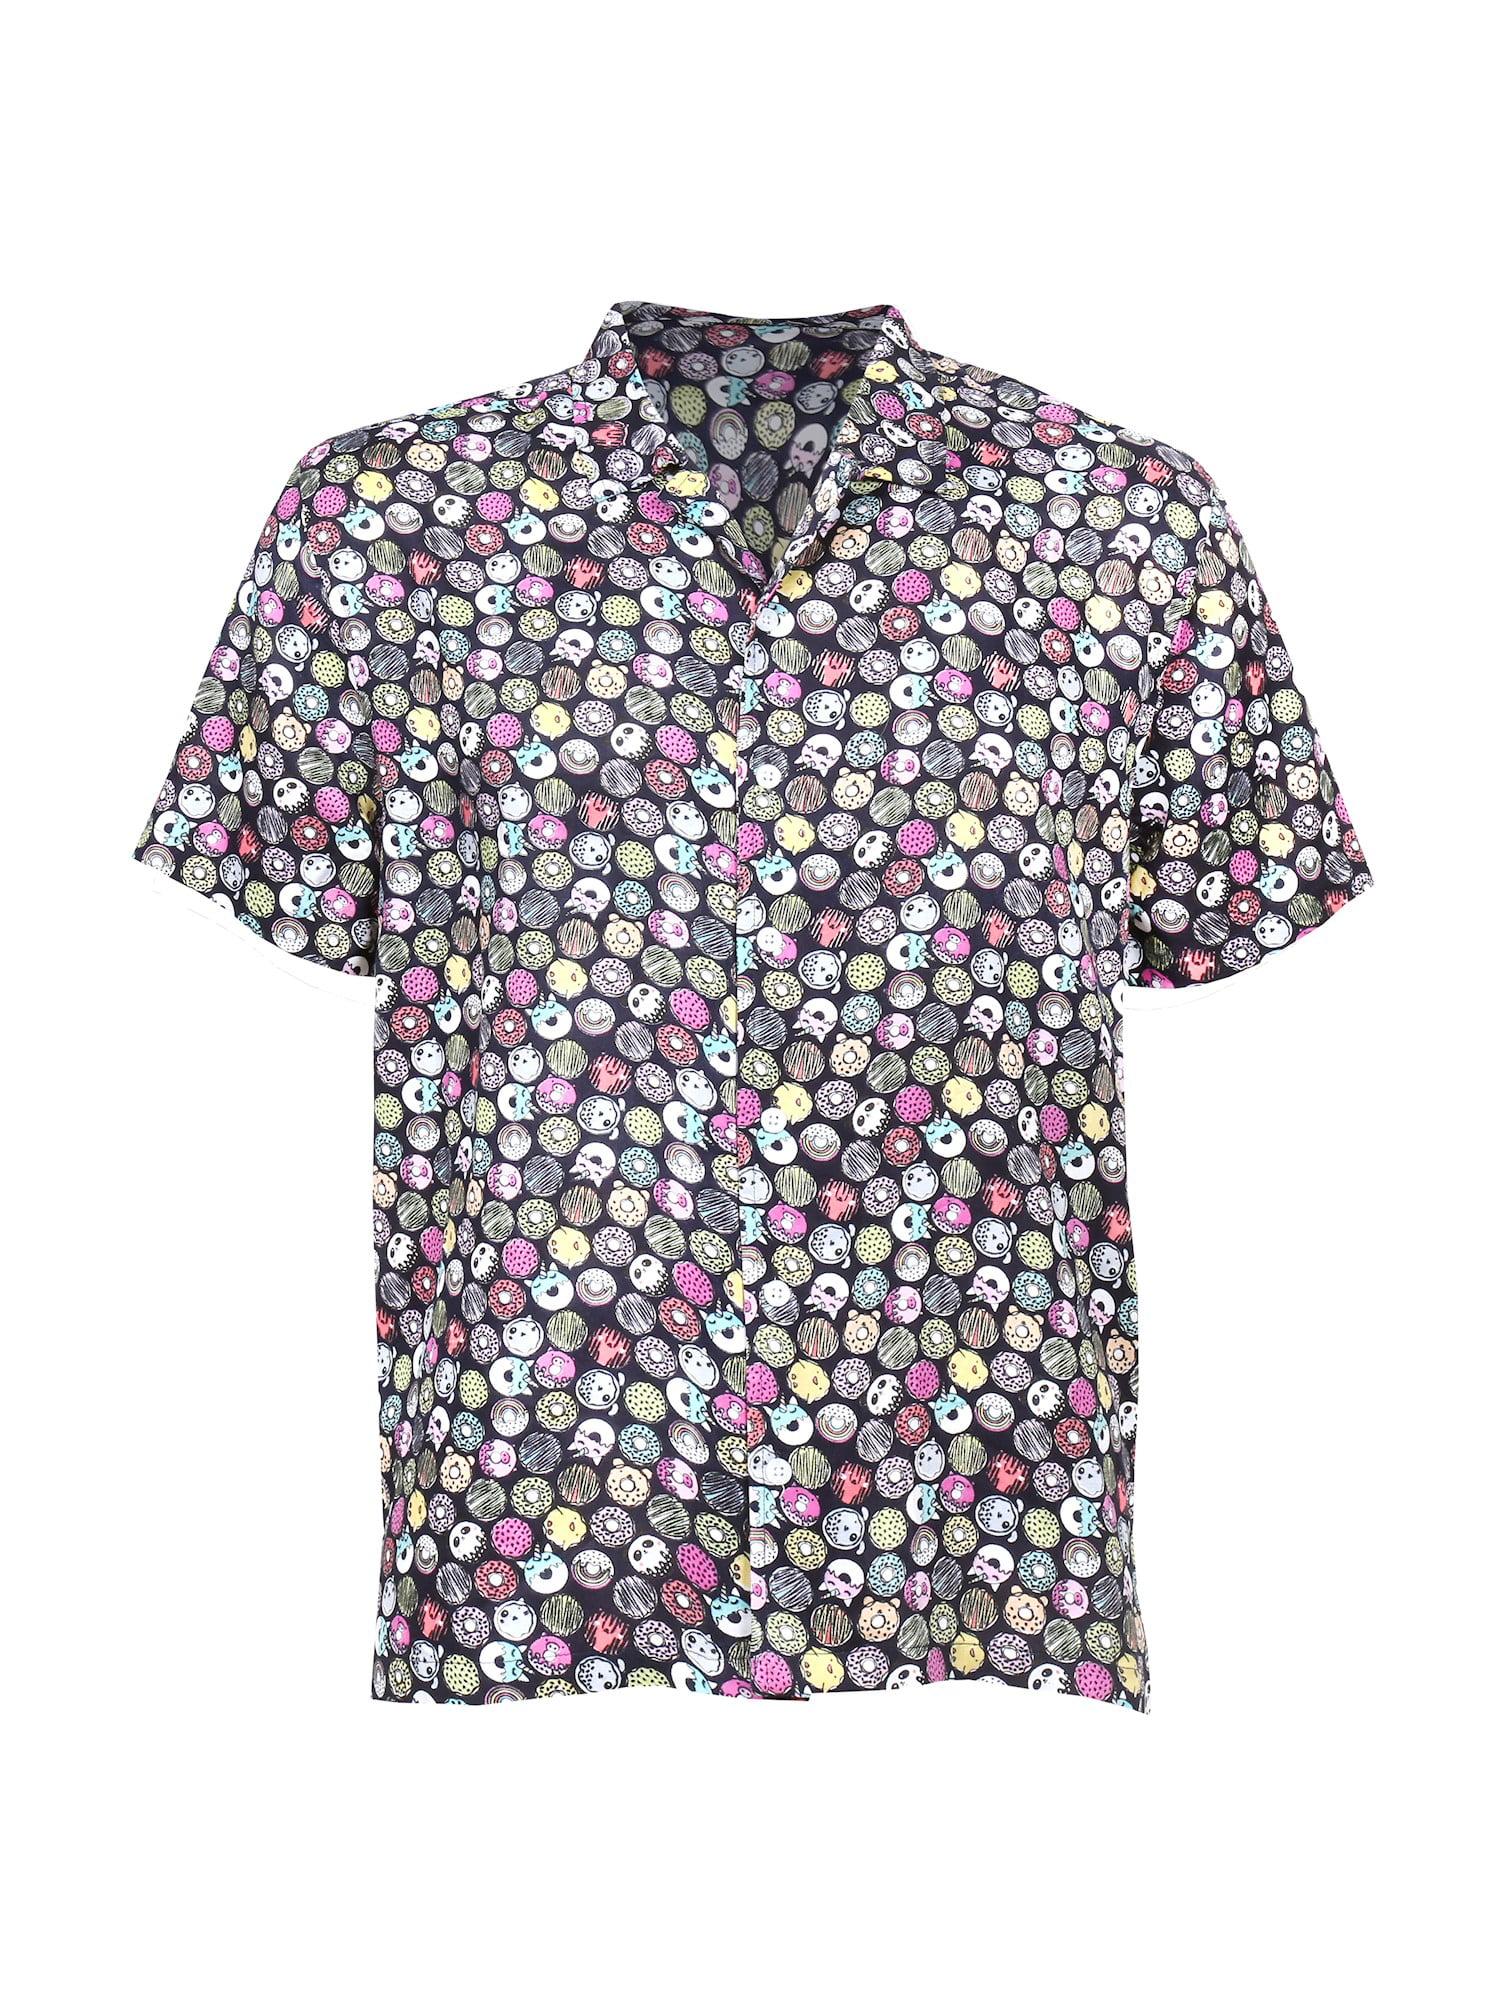 Pool Party Unicorns /& Donuts Men/'s Button Down Short Sleeve Shirt